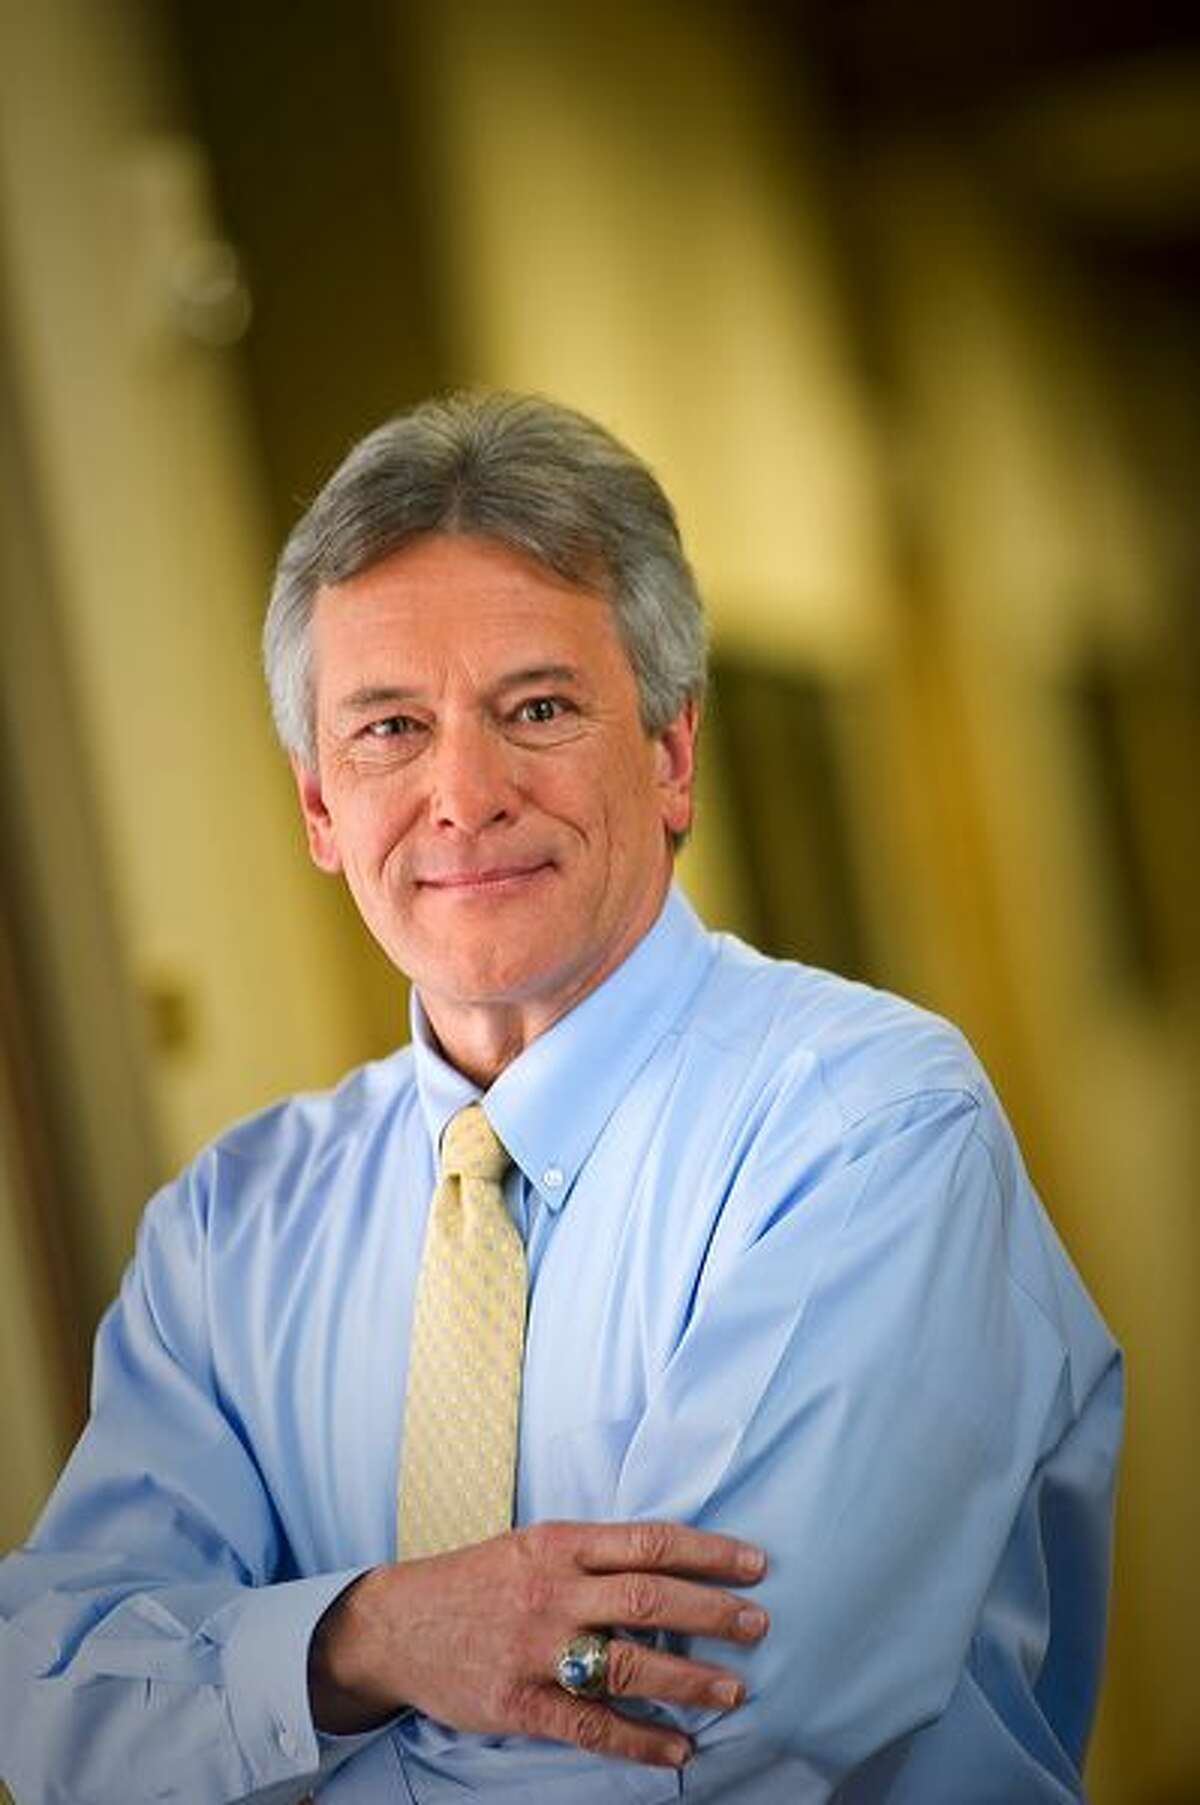 Jack Lipinski is CEO of CVR Energy